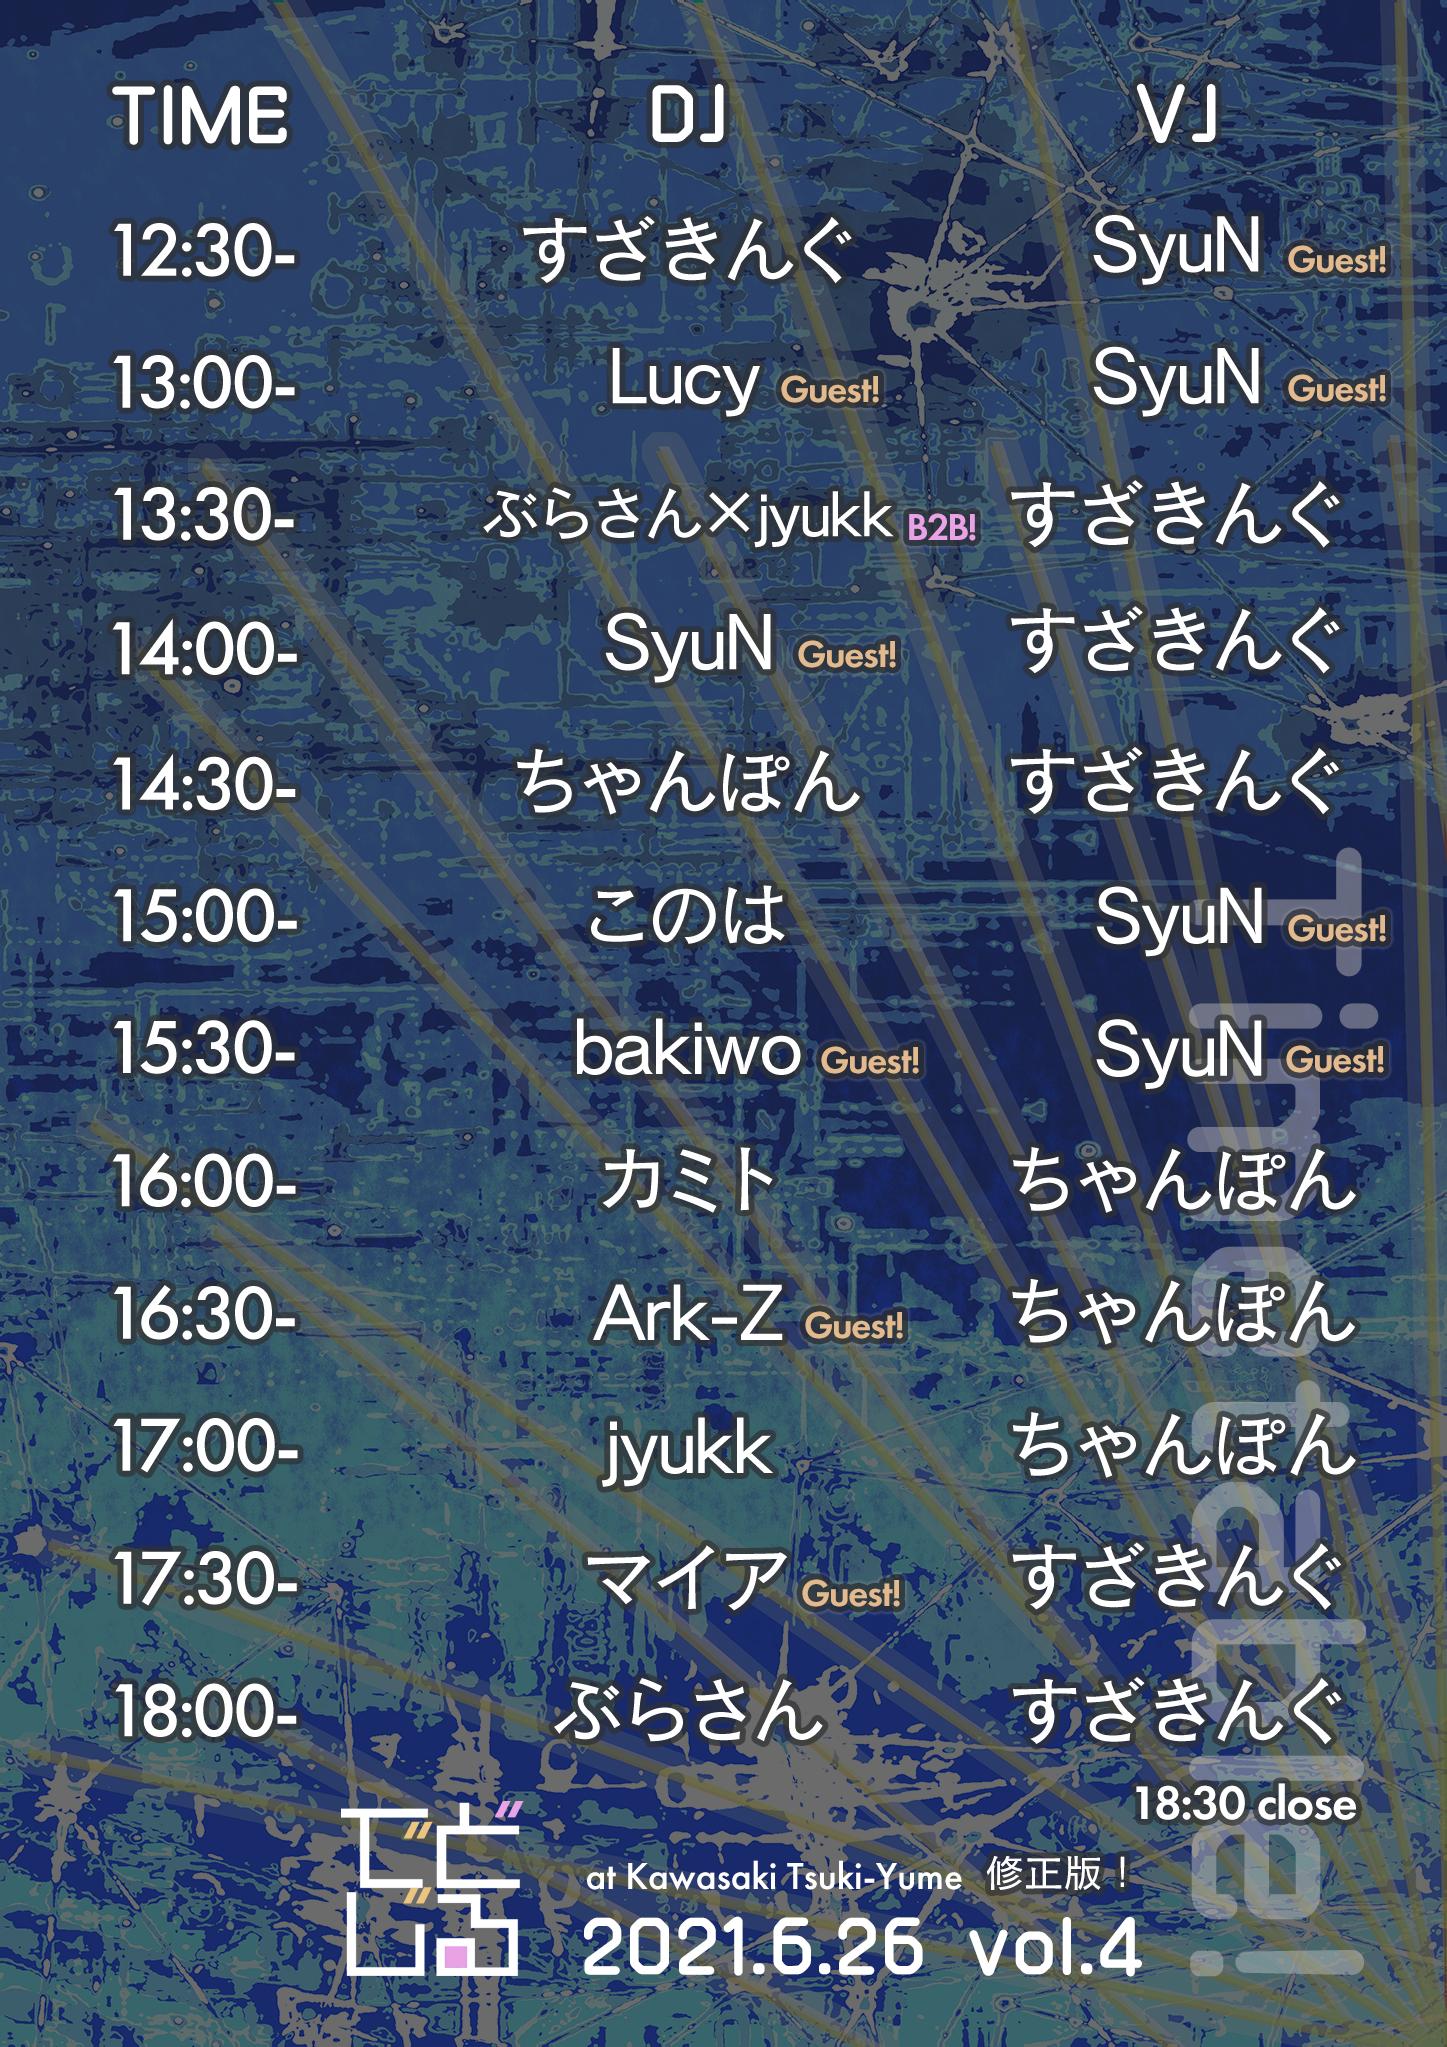 dezidol4_timetable.png